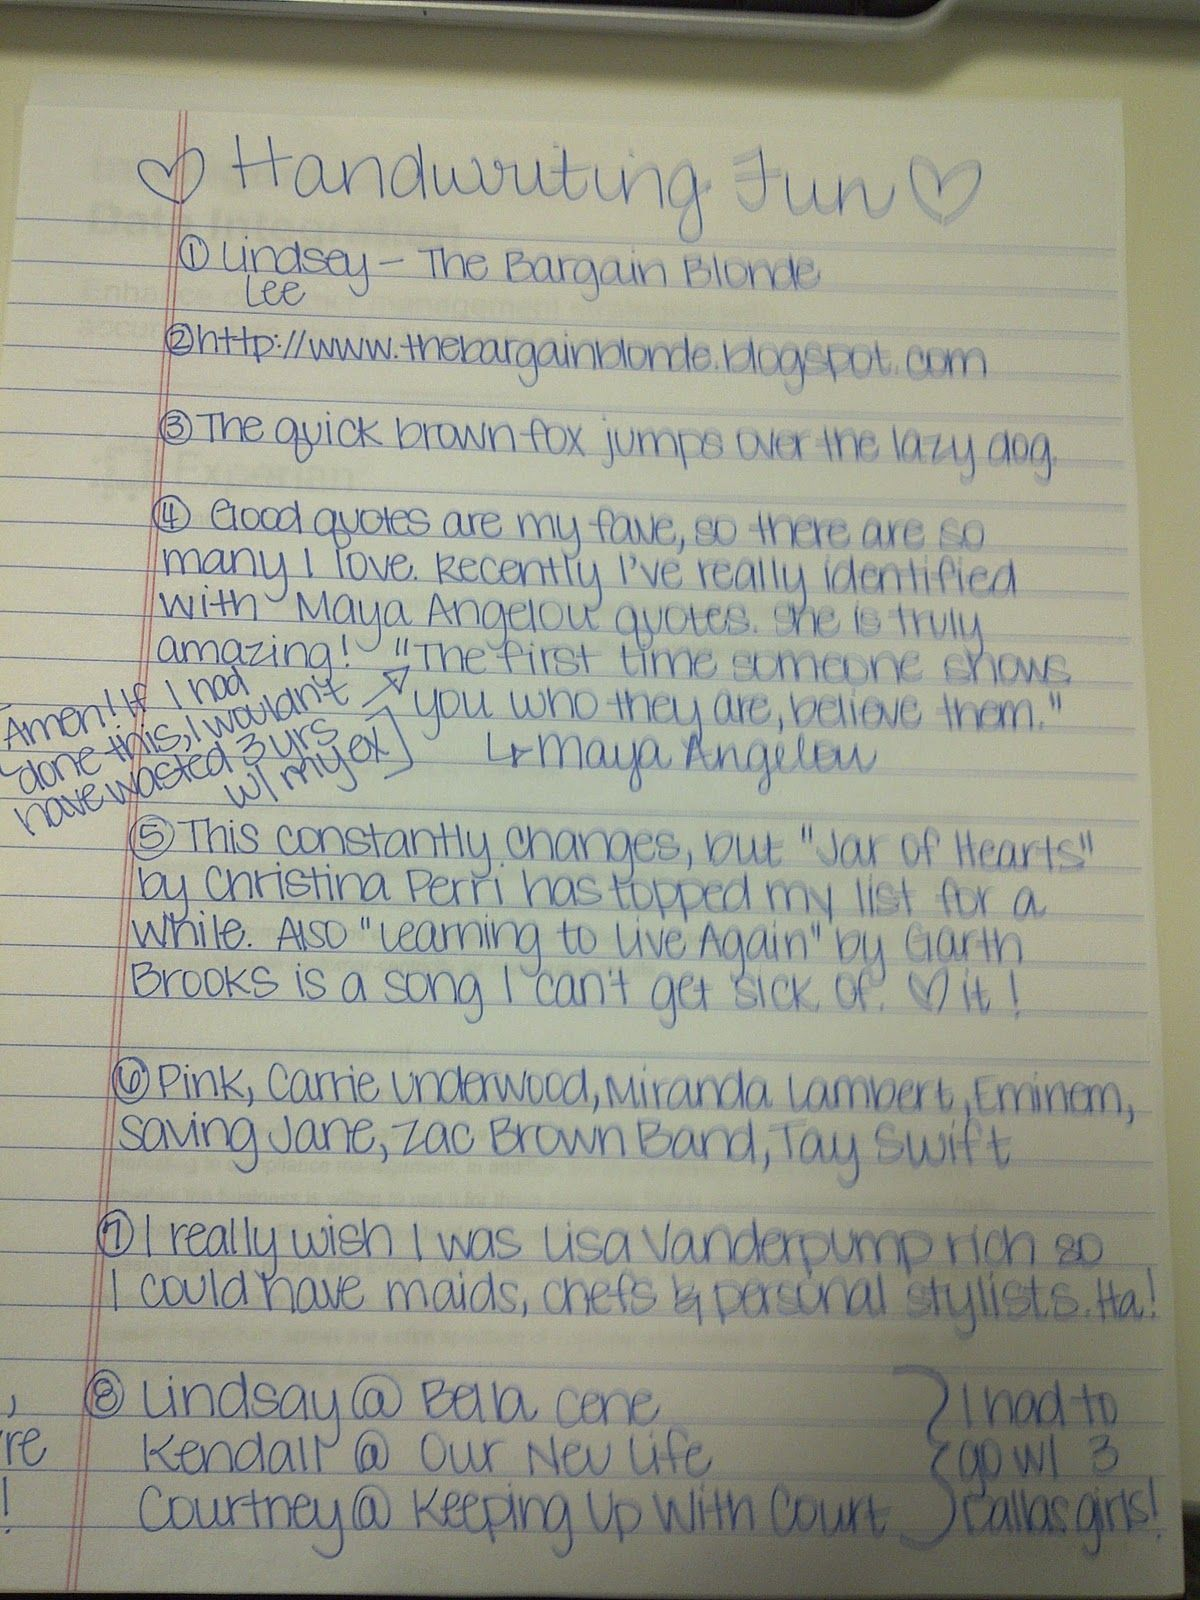 Linda letra | letra | Pinterest | Handschriften, Handschschrift und ...